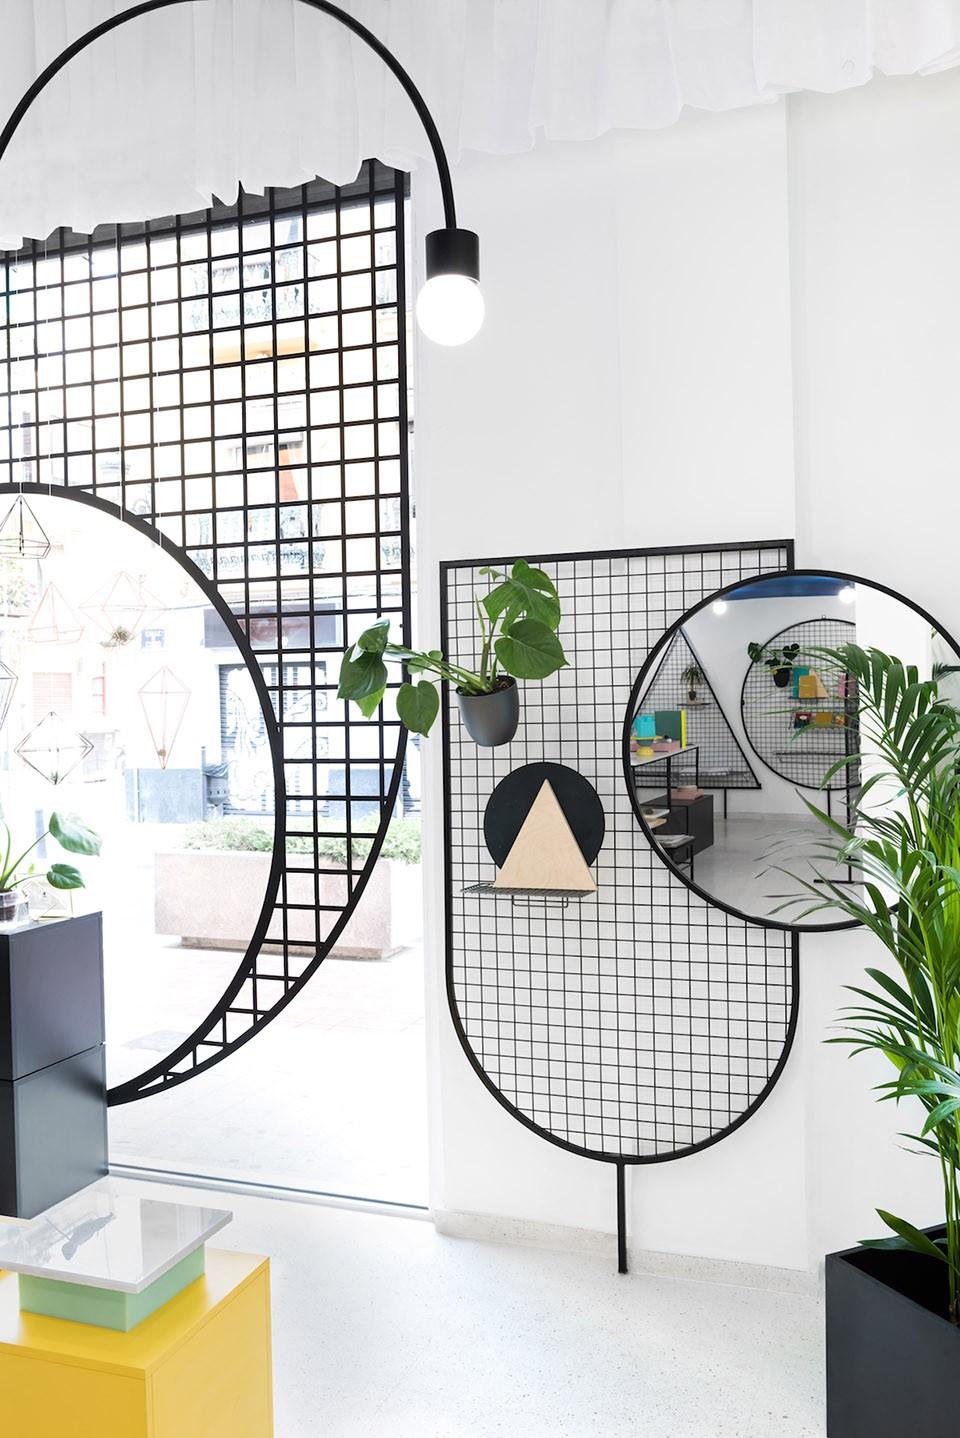 Gnomos-New-Lifestyle-Shop-thatsitmag8.jpg